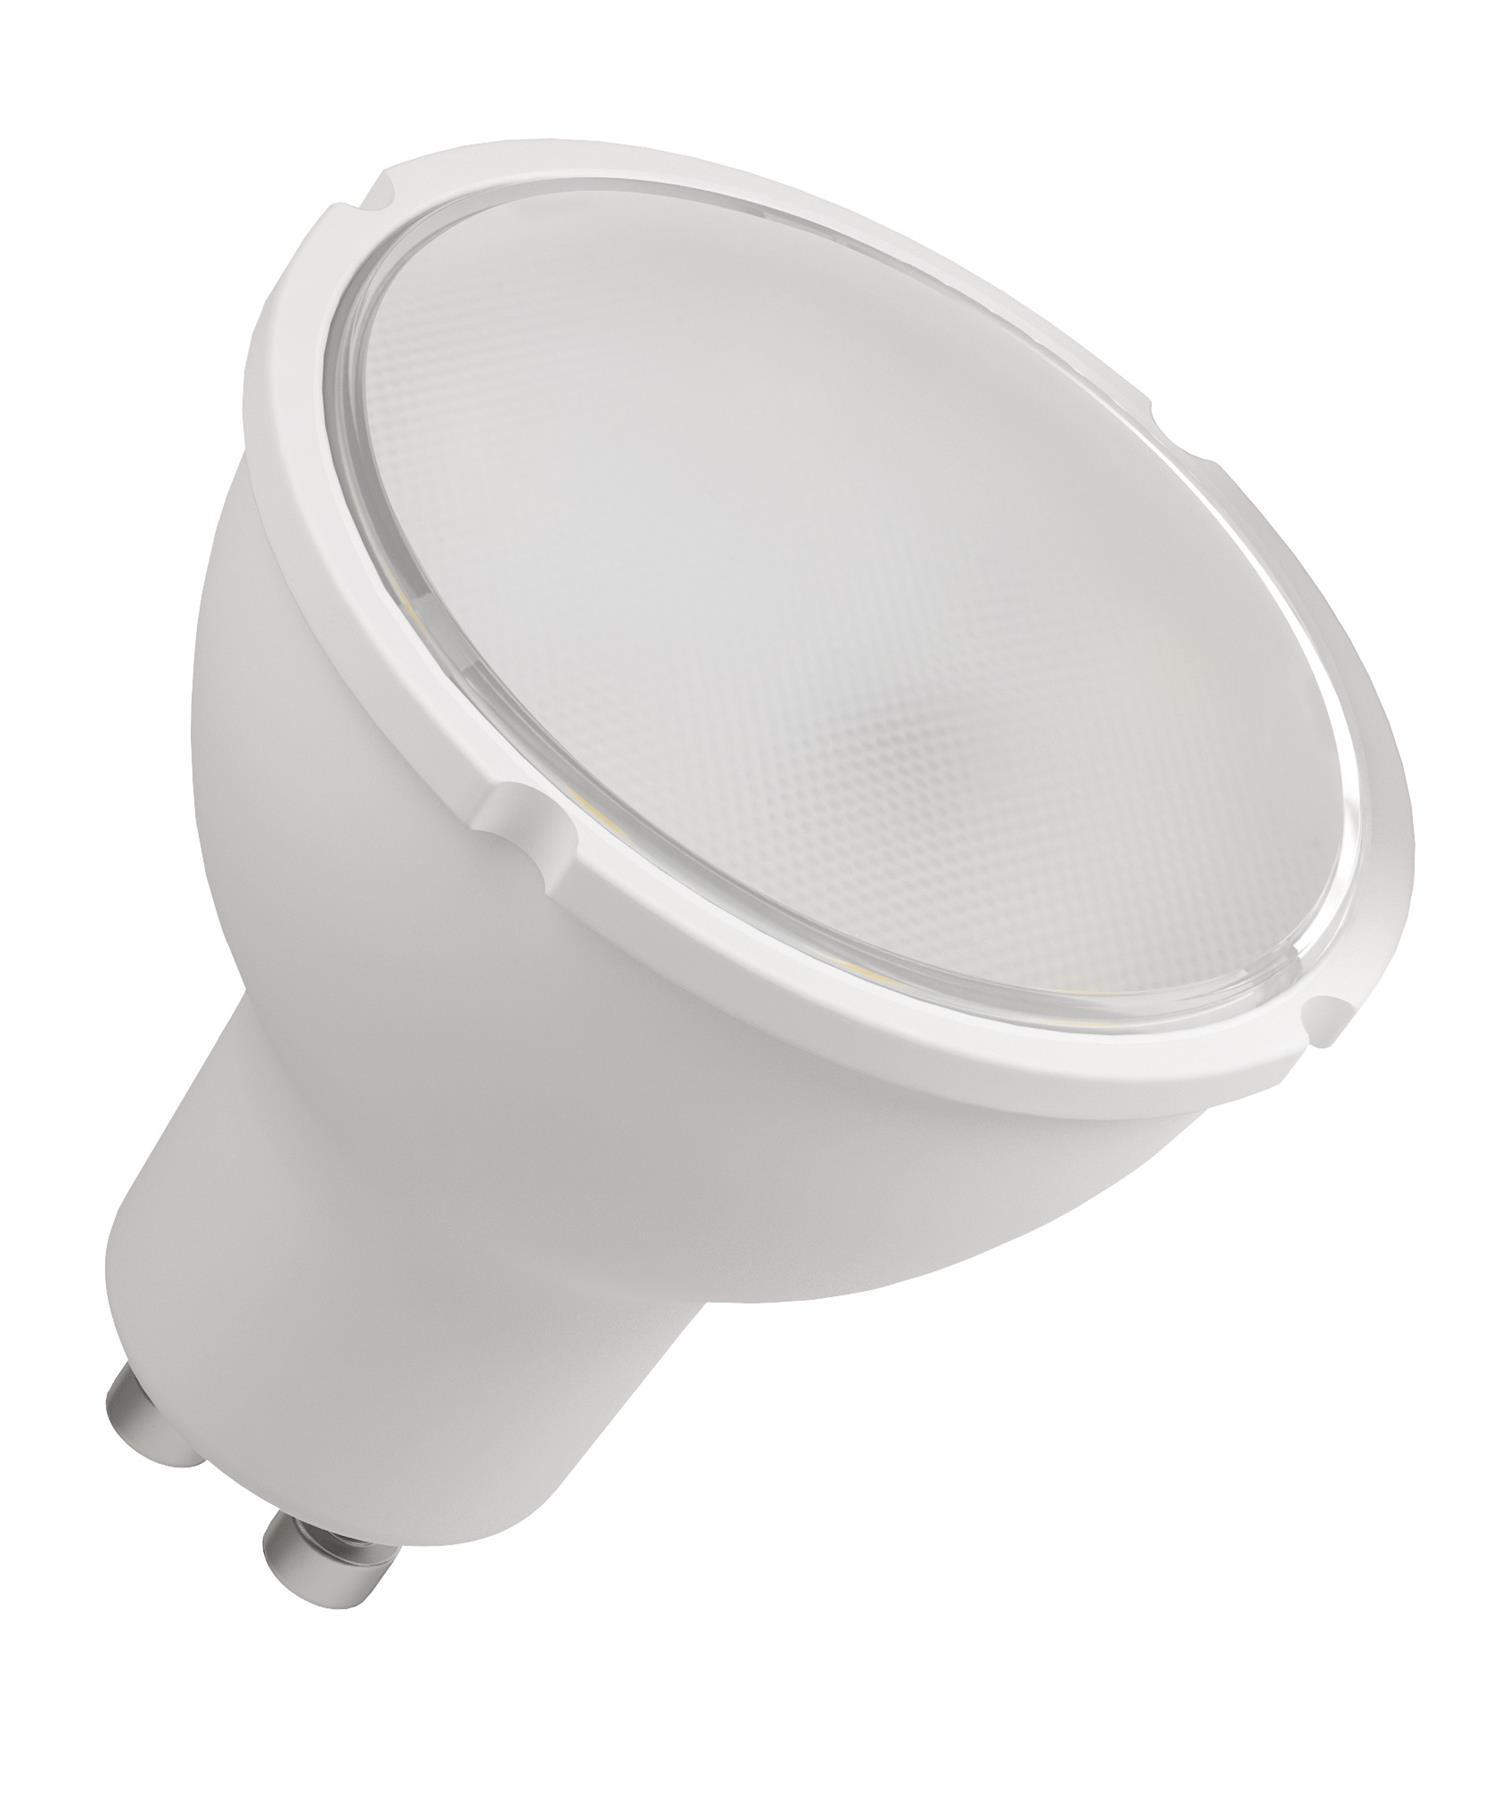 Žarnica LED DIMM 3 STEP 6W GU 10W EMOS